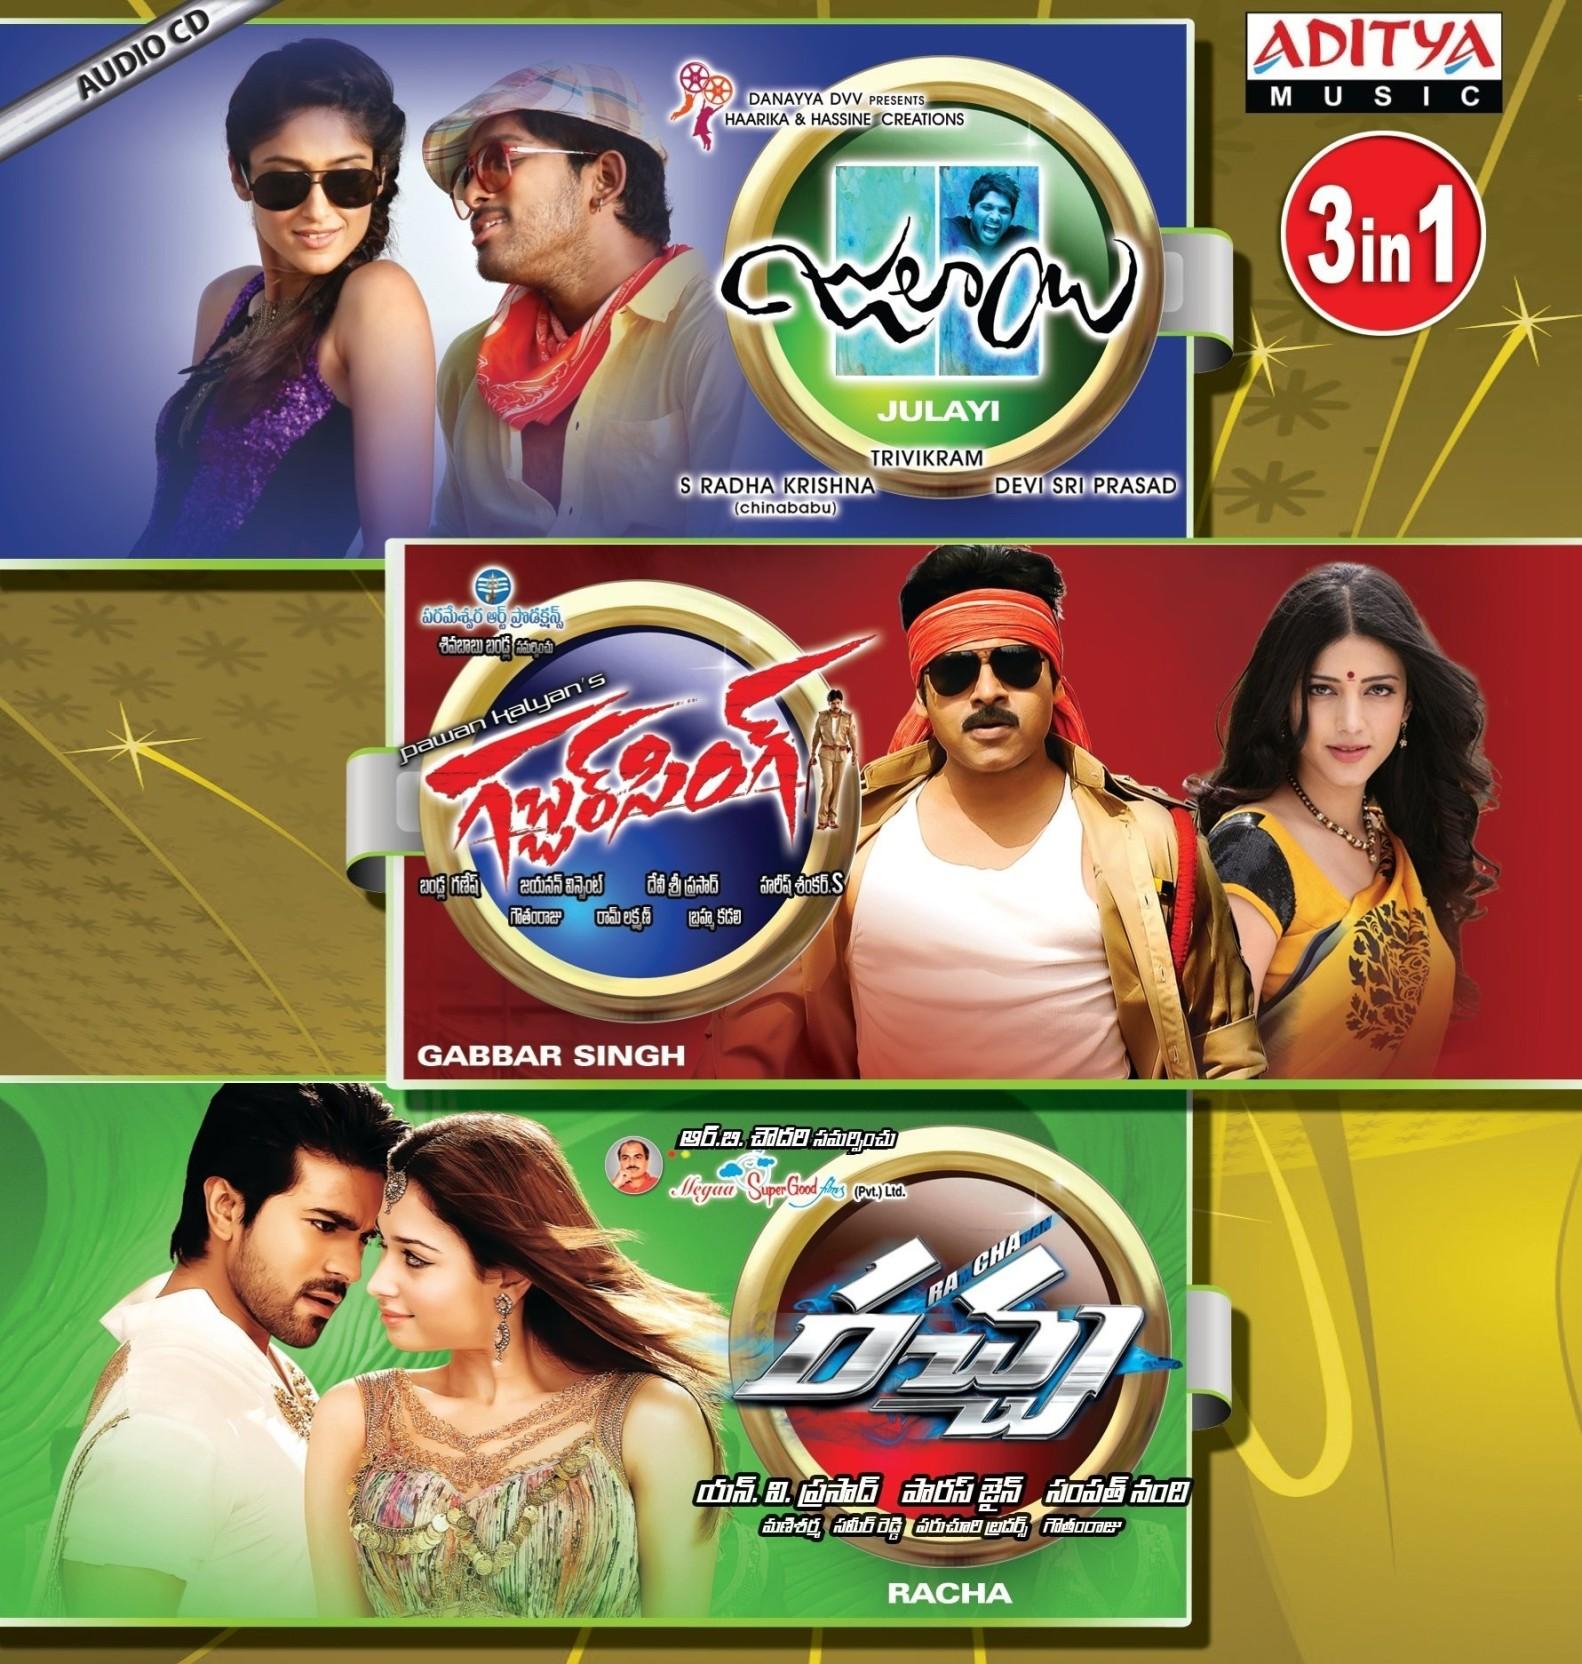 3in1 - Julay / Gabbar Singh / Racha Music Audio CD - Price